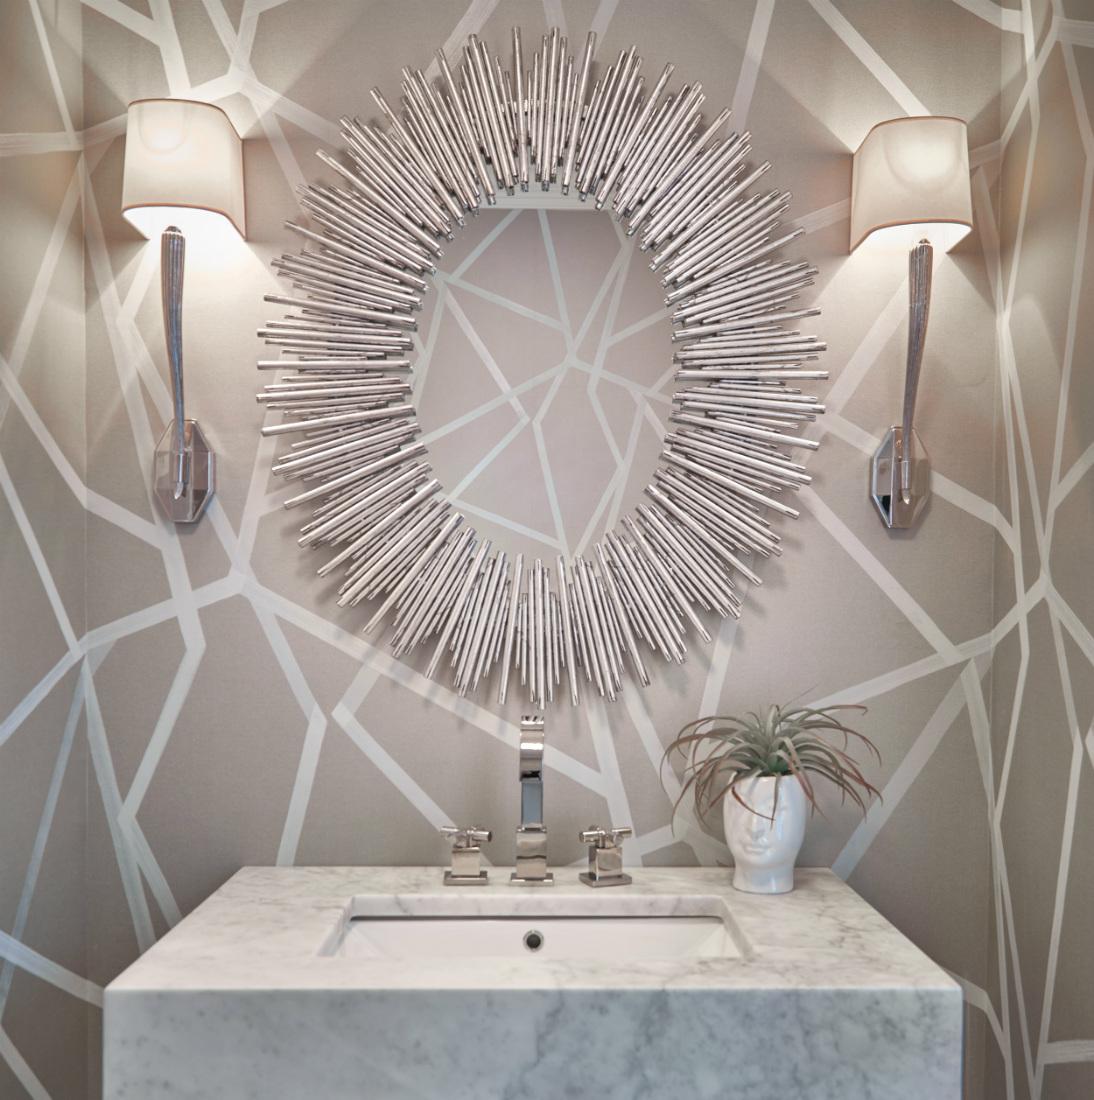 berwyn-pa-bathroom-interior-design-fuller-interiors